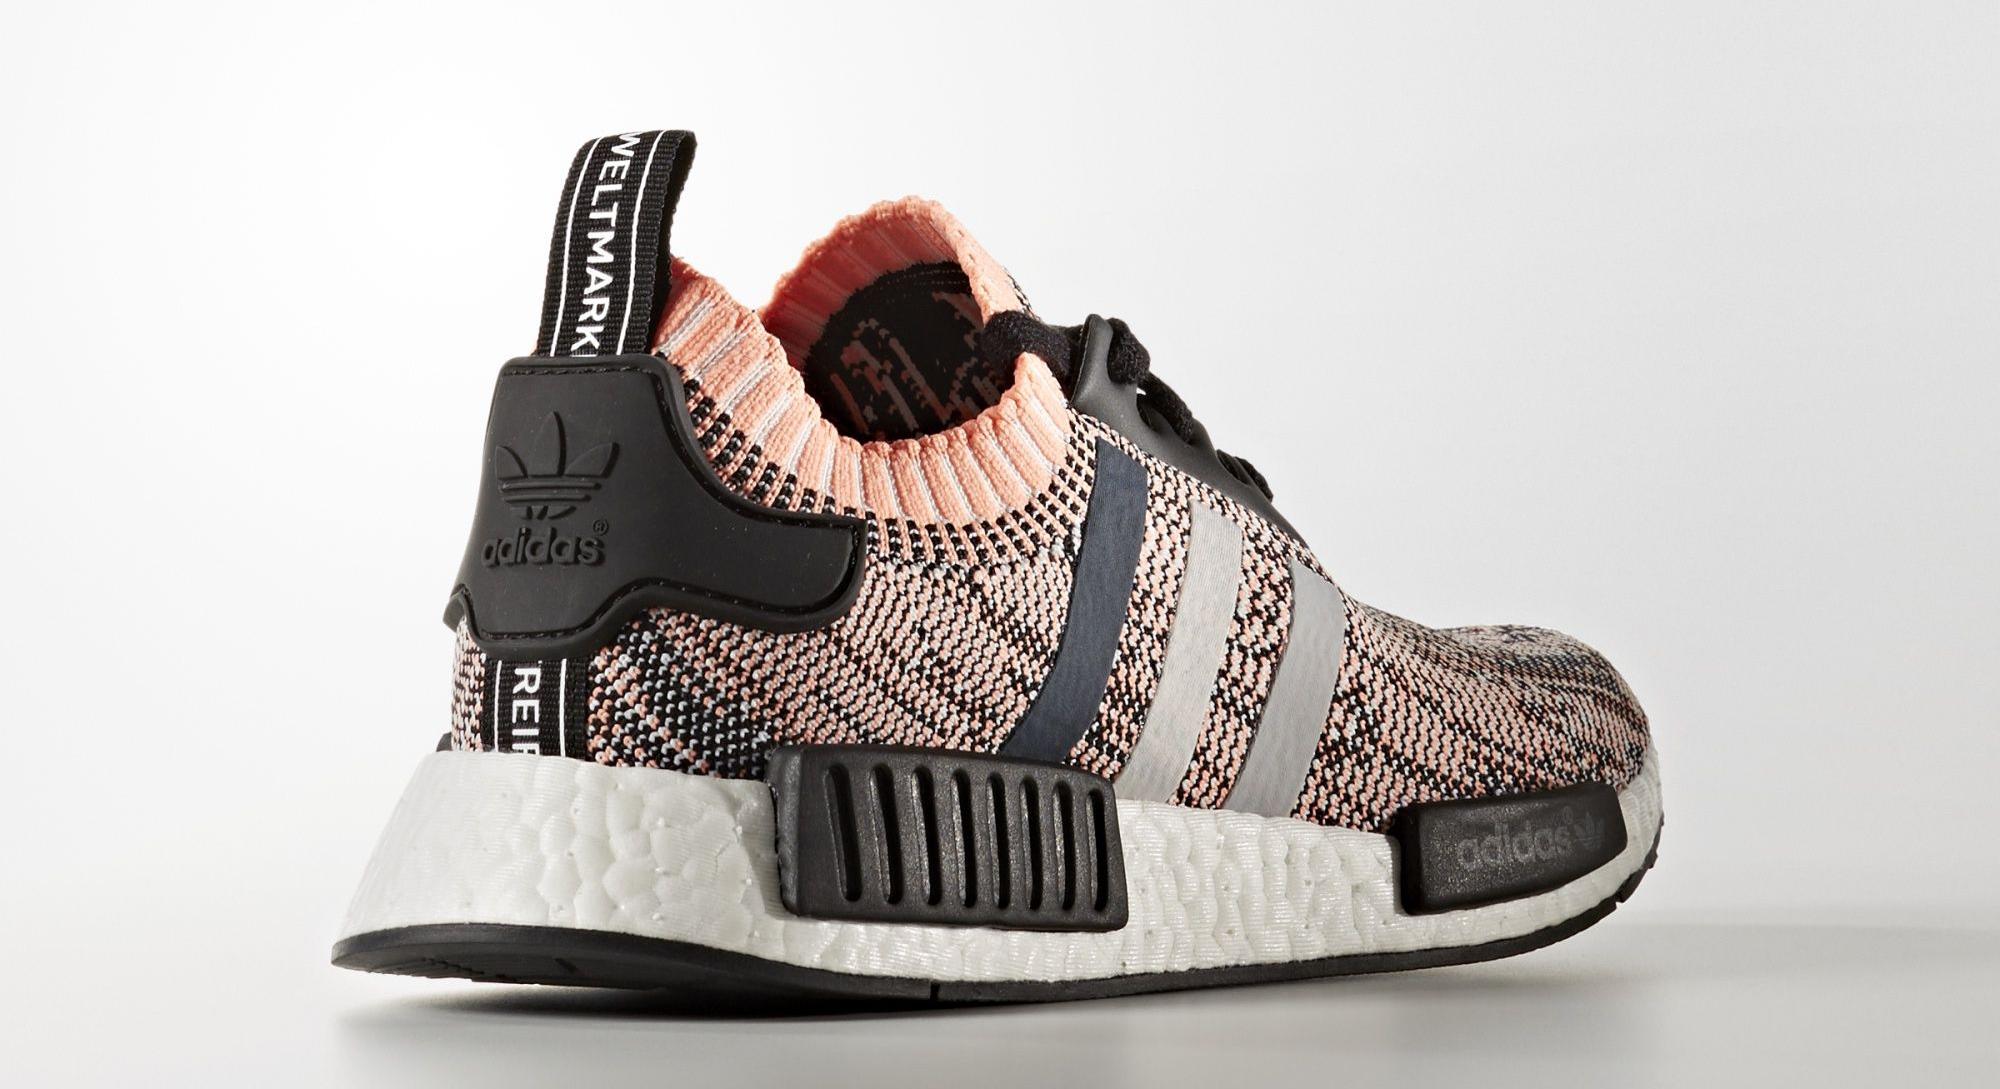 Adidas Glitch Camo NMD BB2361 Pink Heel